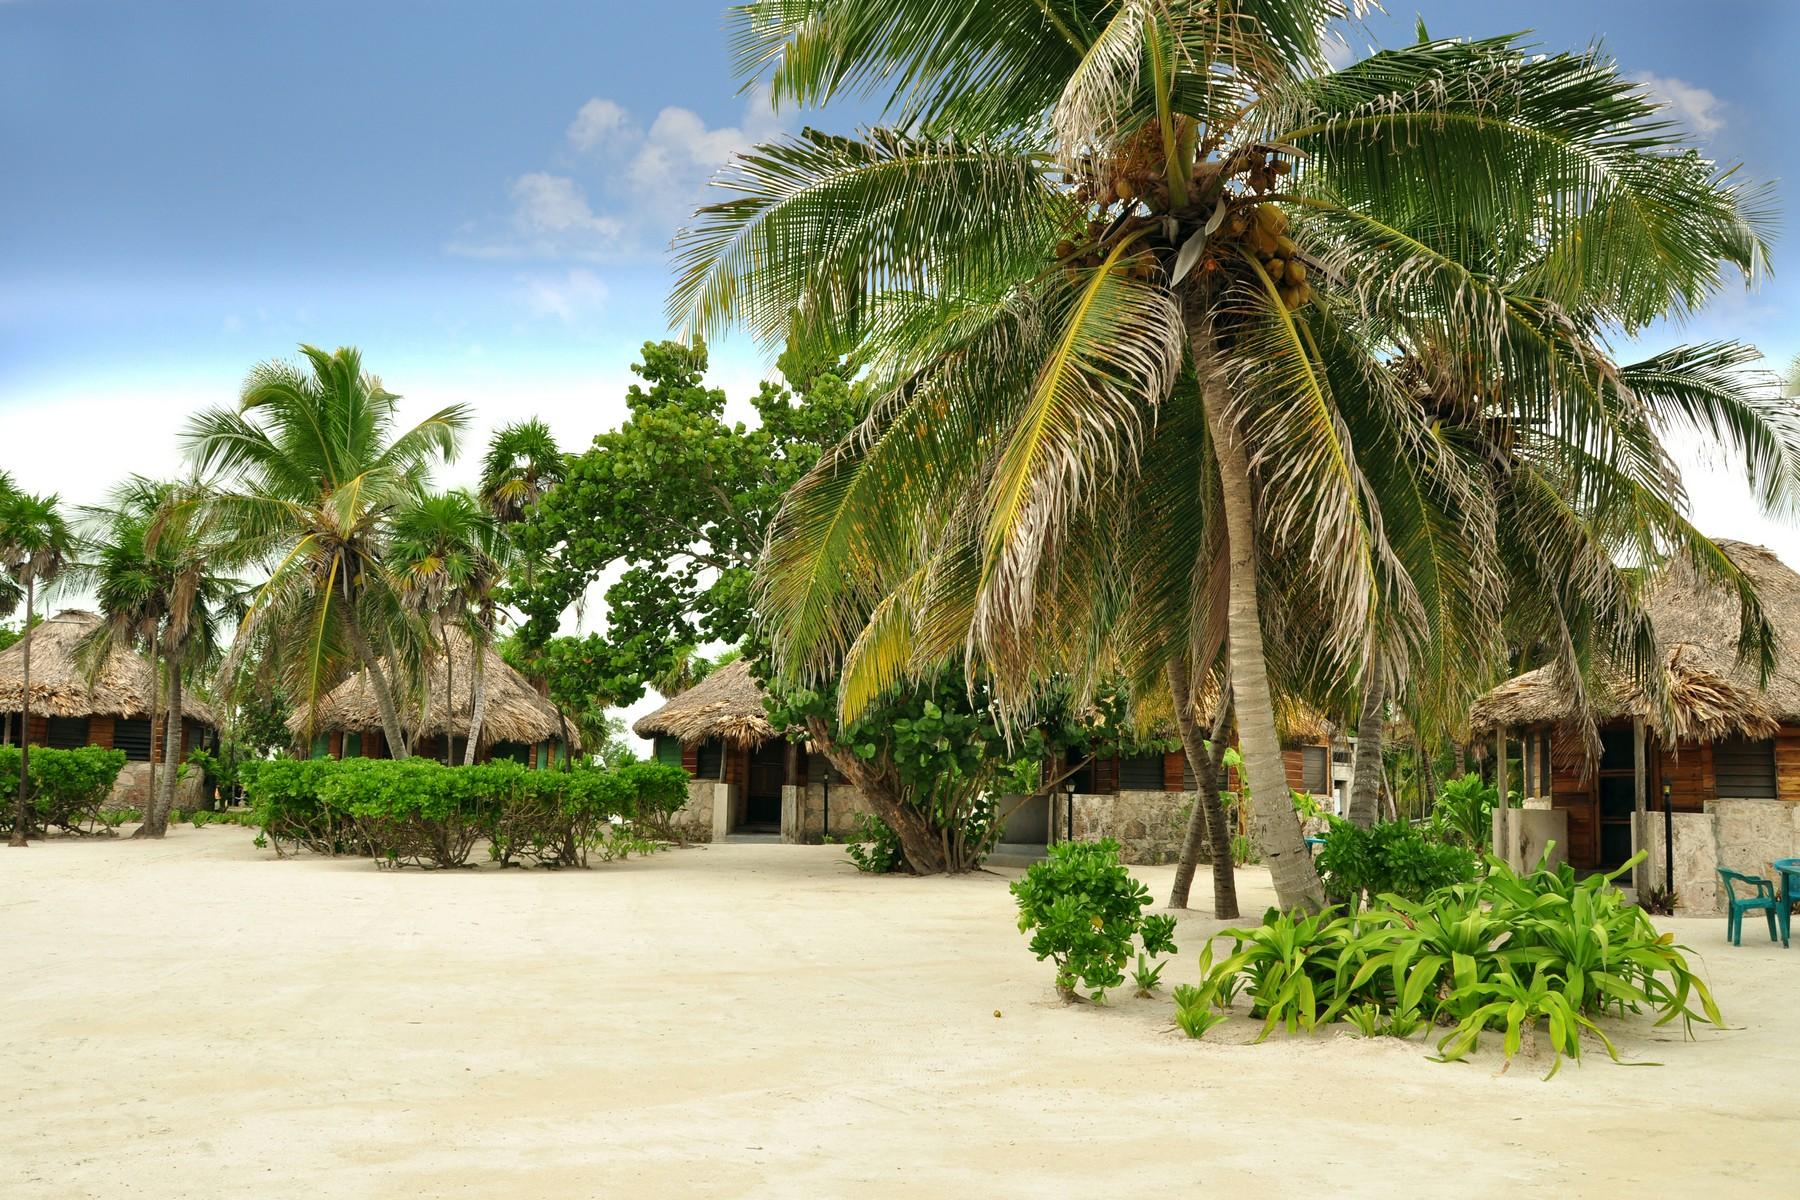 Additional photo for property listing at COSTA MAYA HOTEL CON FRENTE DE PLAYA  Xcalak, Quintana Roo 77940 México